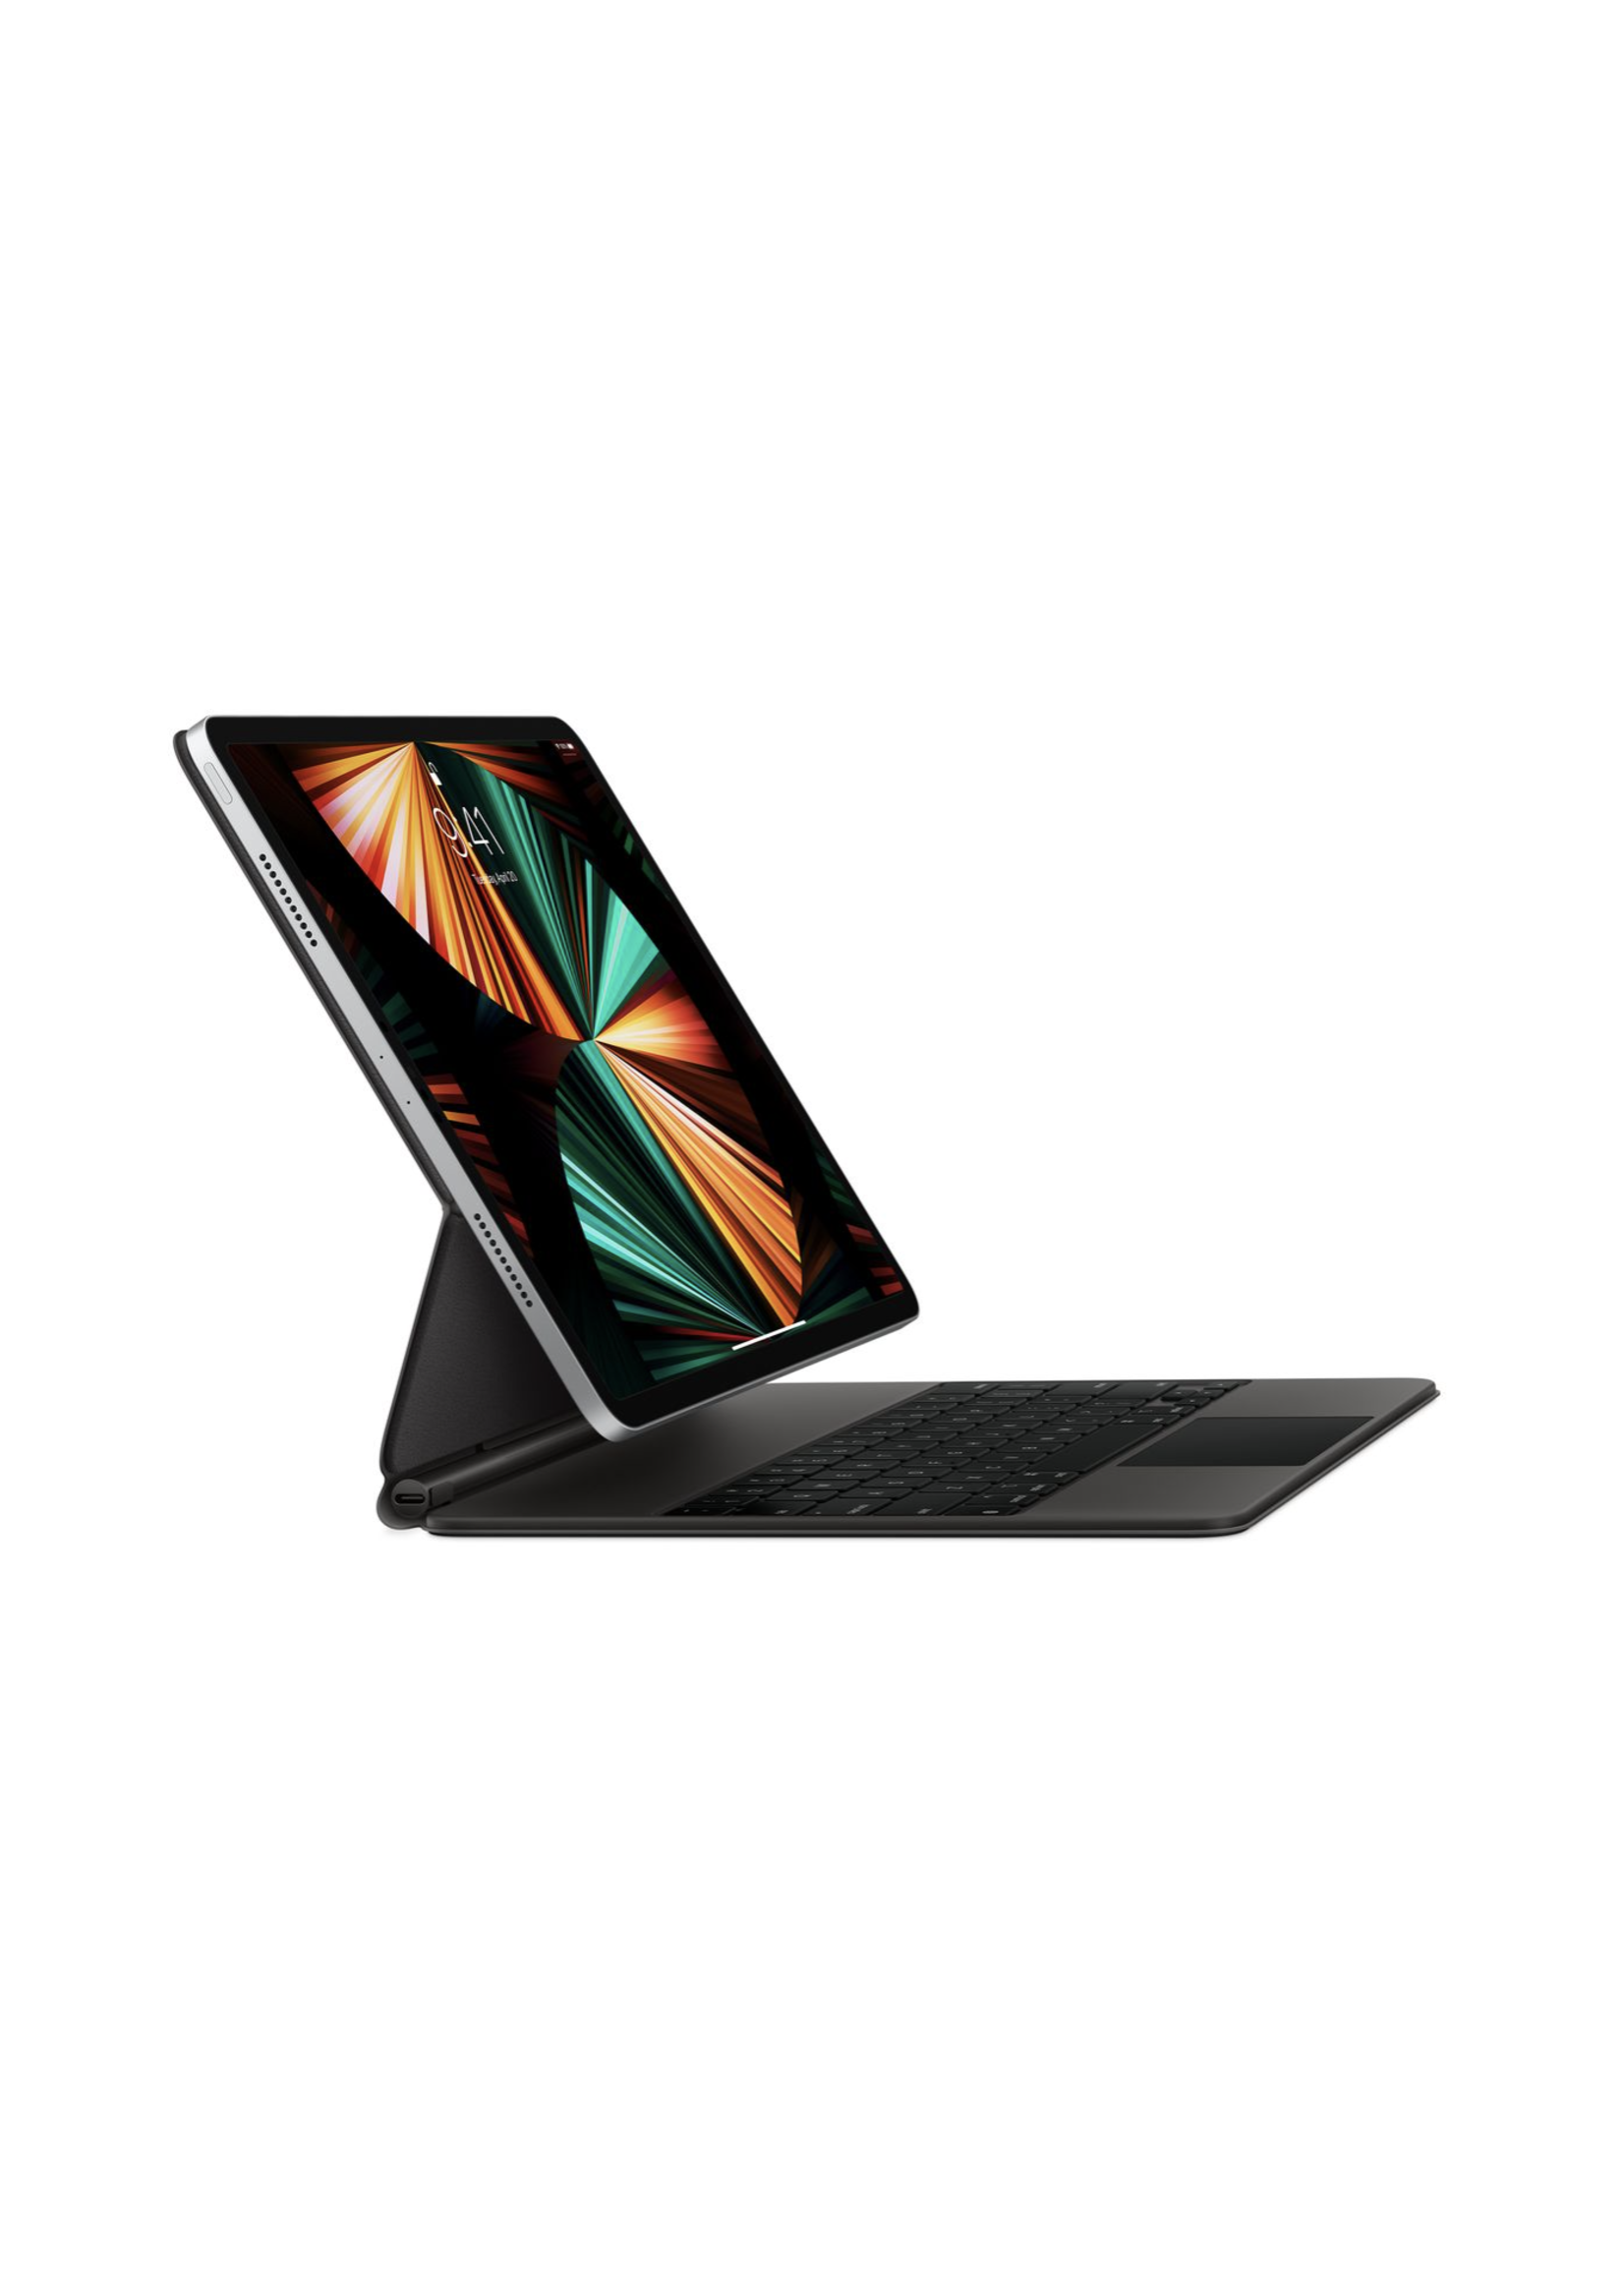 Apple iPad Pro 12.9-inch Magic Keyboard